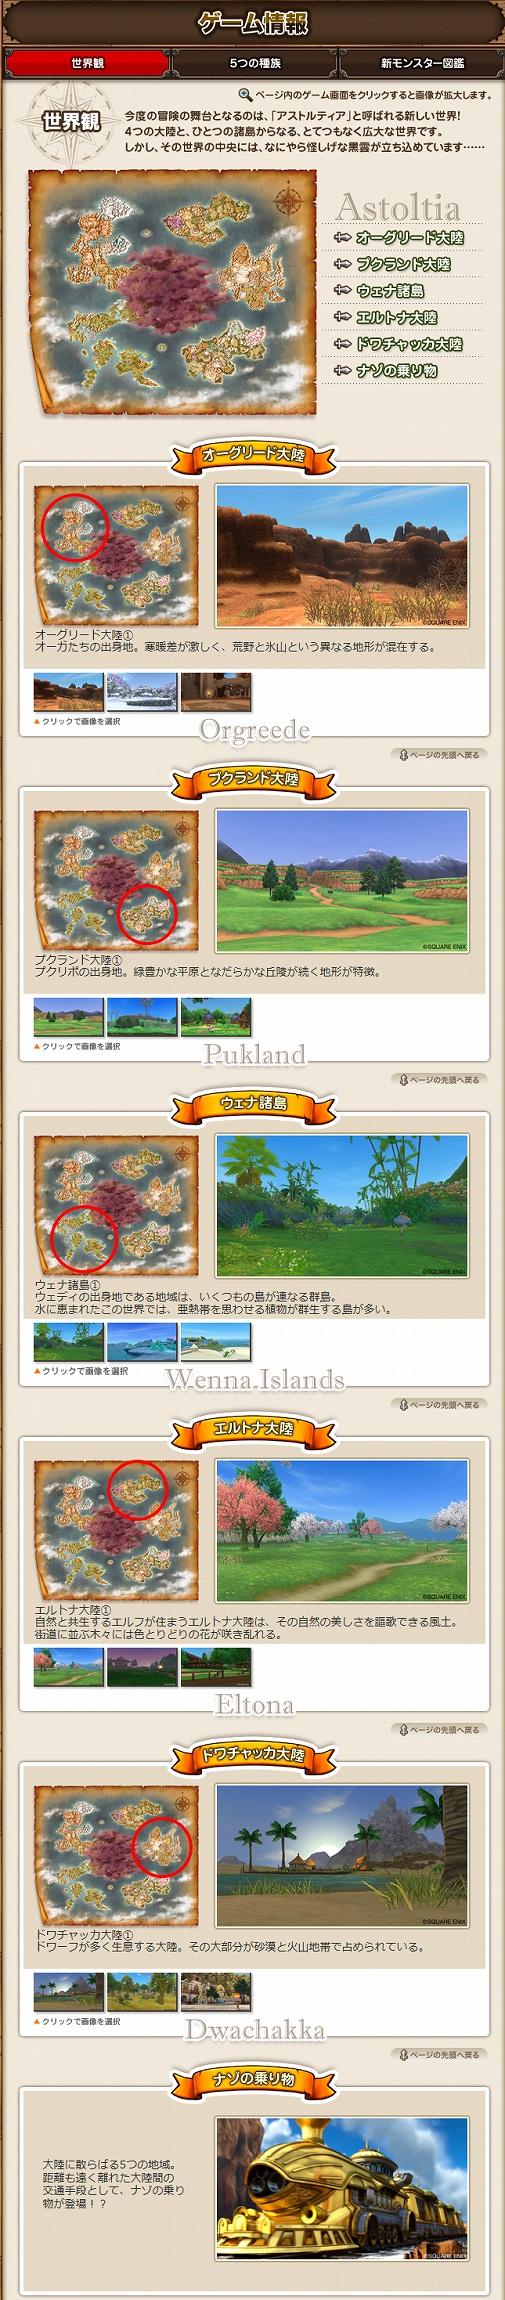 0922dorakue10-4s-.jpg